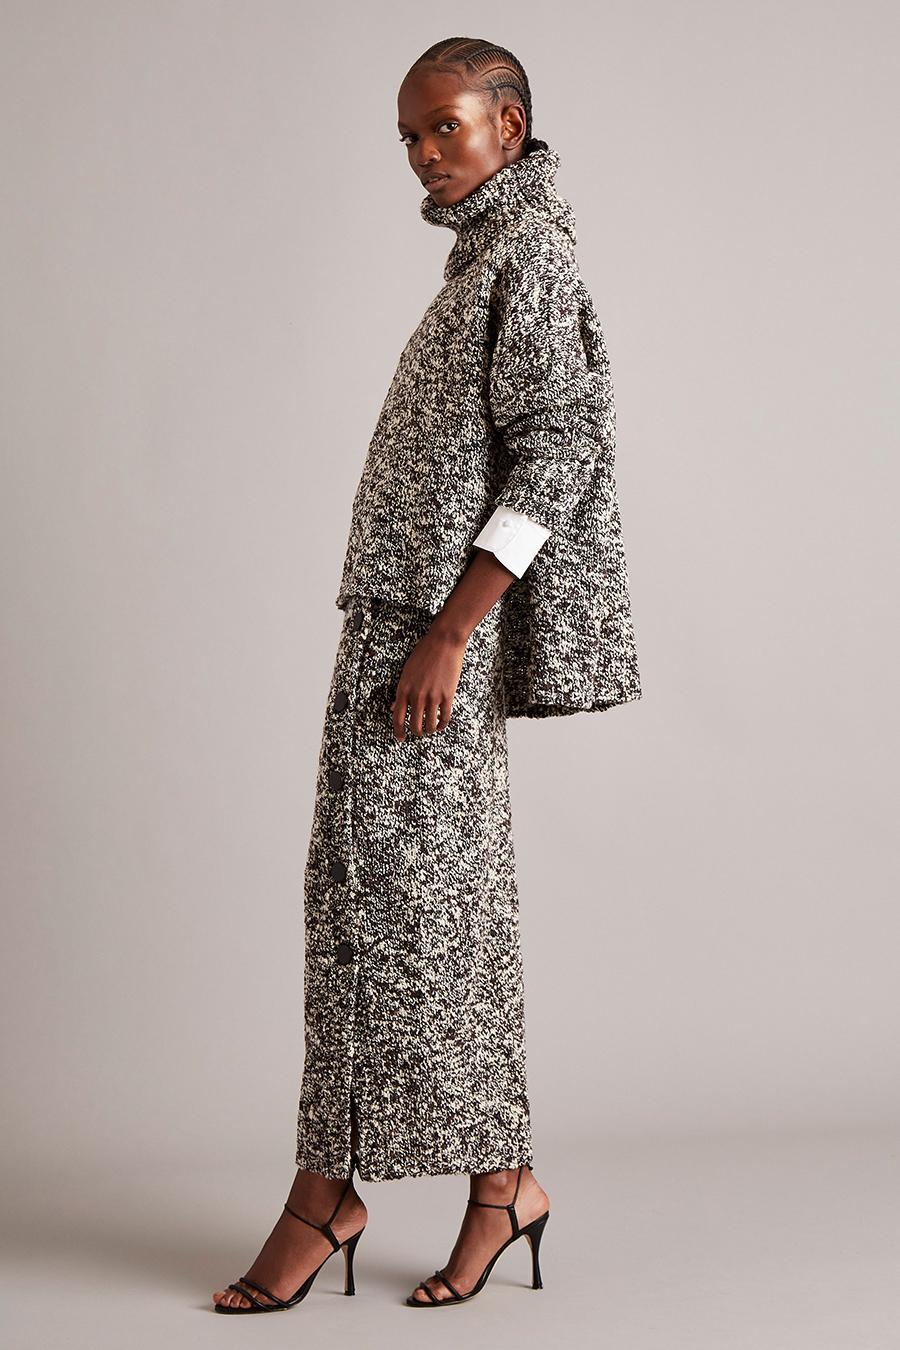 тренды осень зима 2021 2021 трикотаж вязаный костюм юбка свитер серый меланж макси разрез